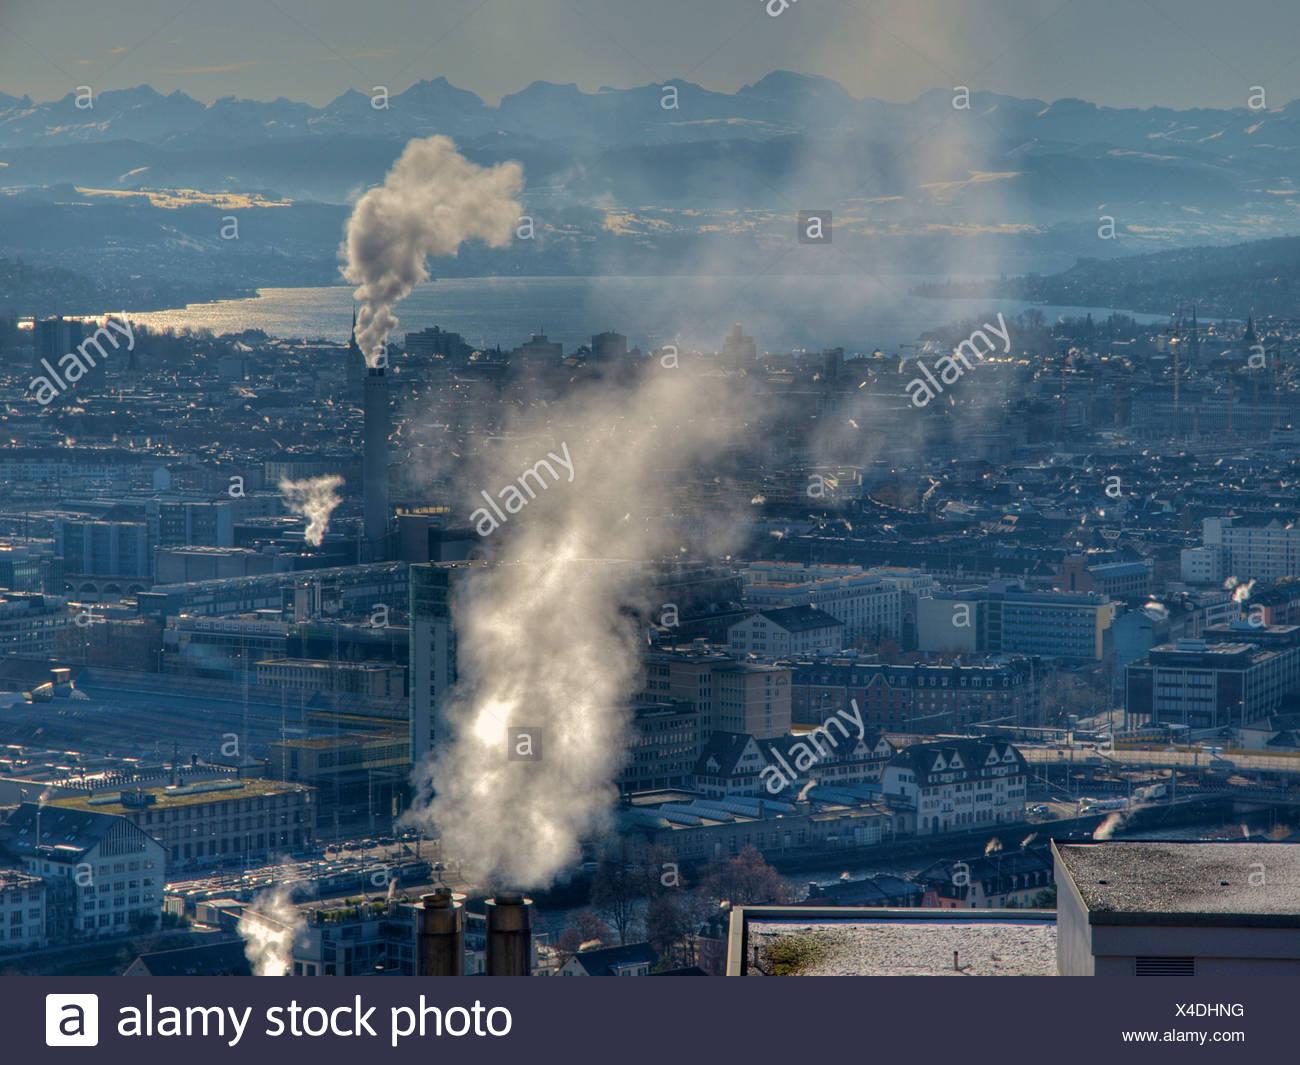 Smoke, cold, smoke, Zurich, Switzerland, Zurich lake, winter - Stock Image